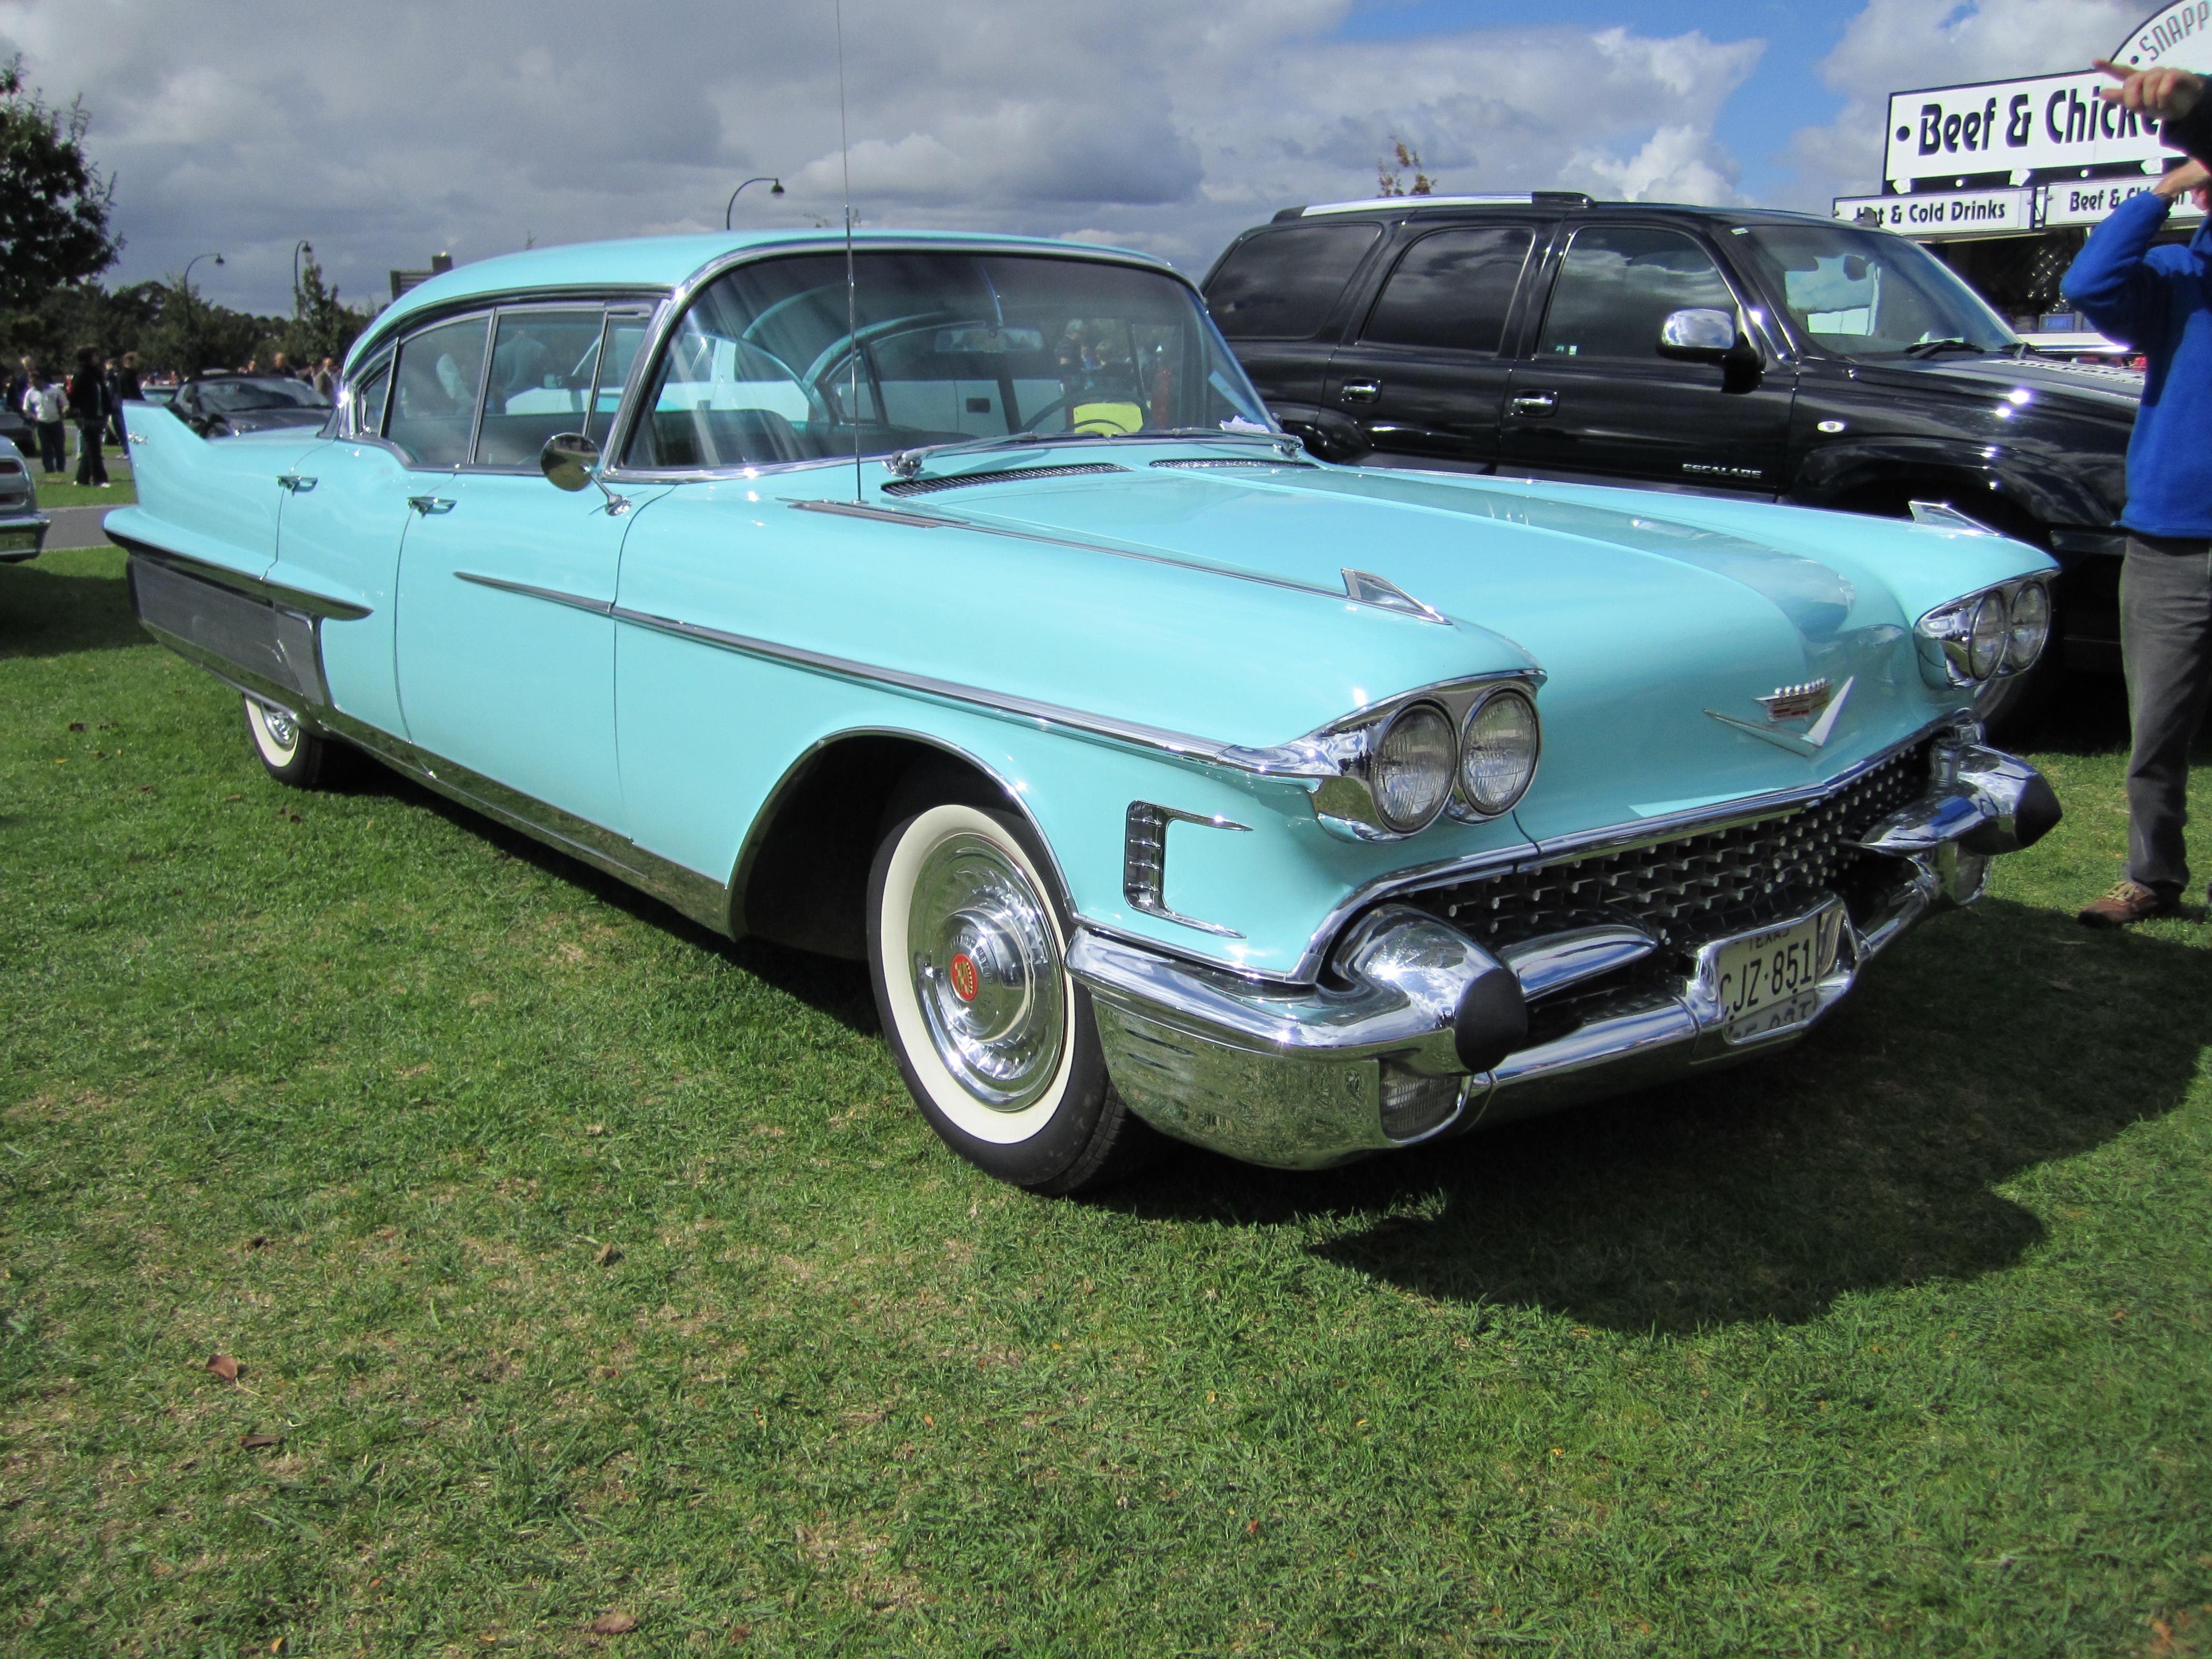 File 1958 Cadillac Sedan Deville Jpg Wikimedia Commons